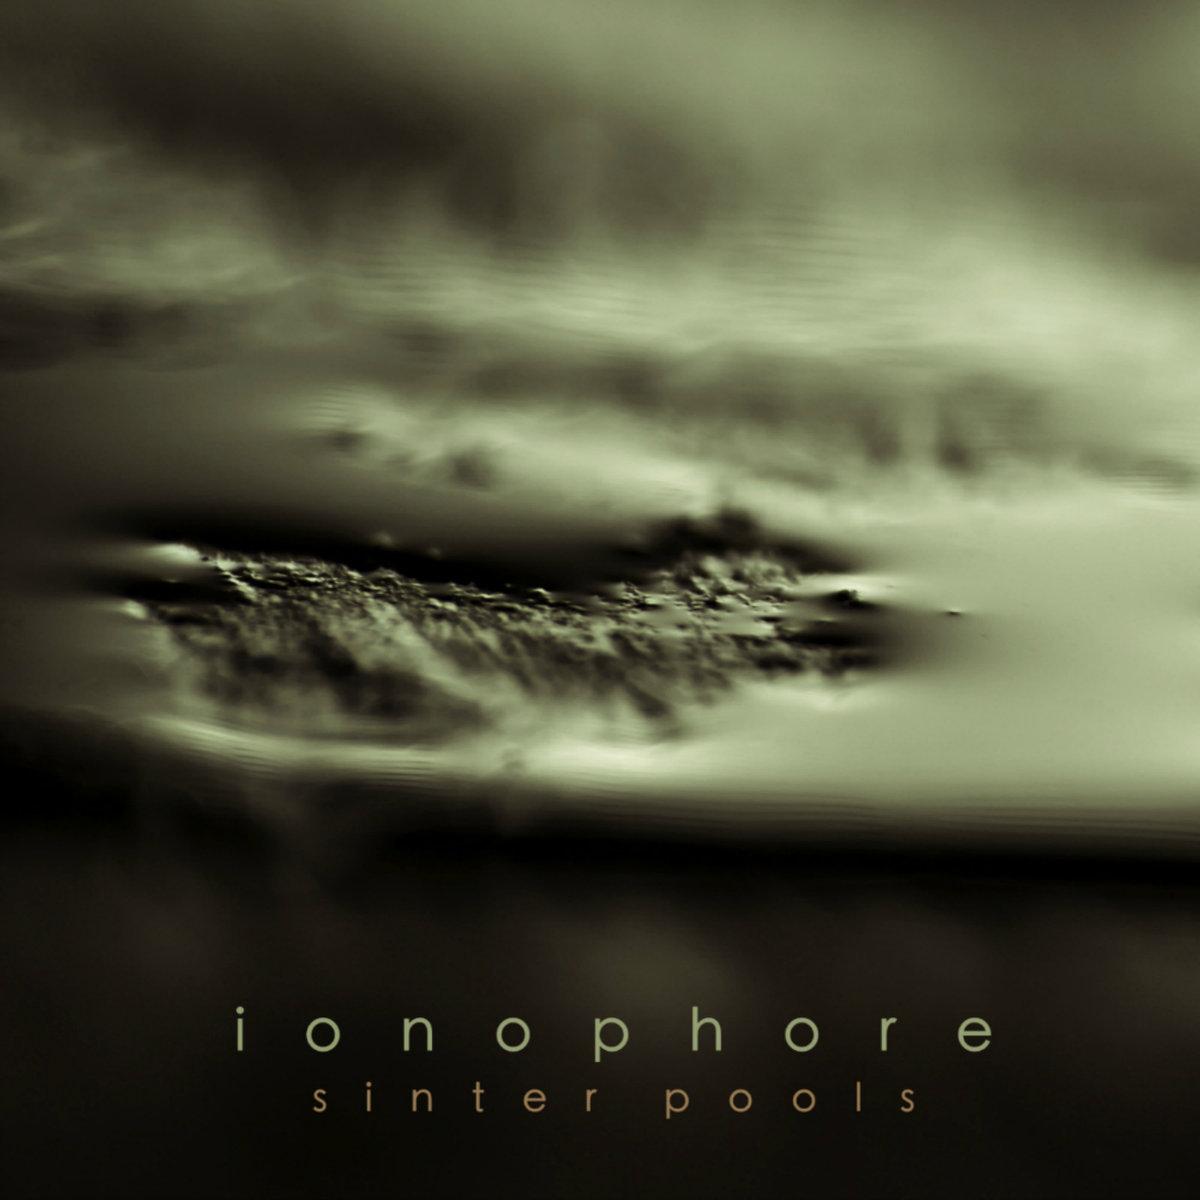 Ionophore - Sinter Pools CD - 画像1